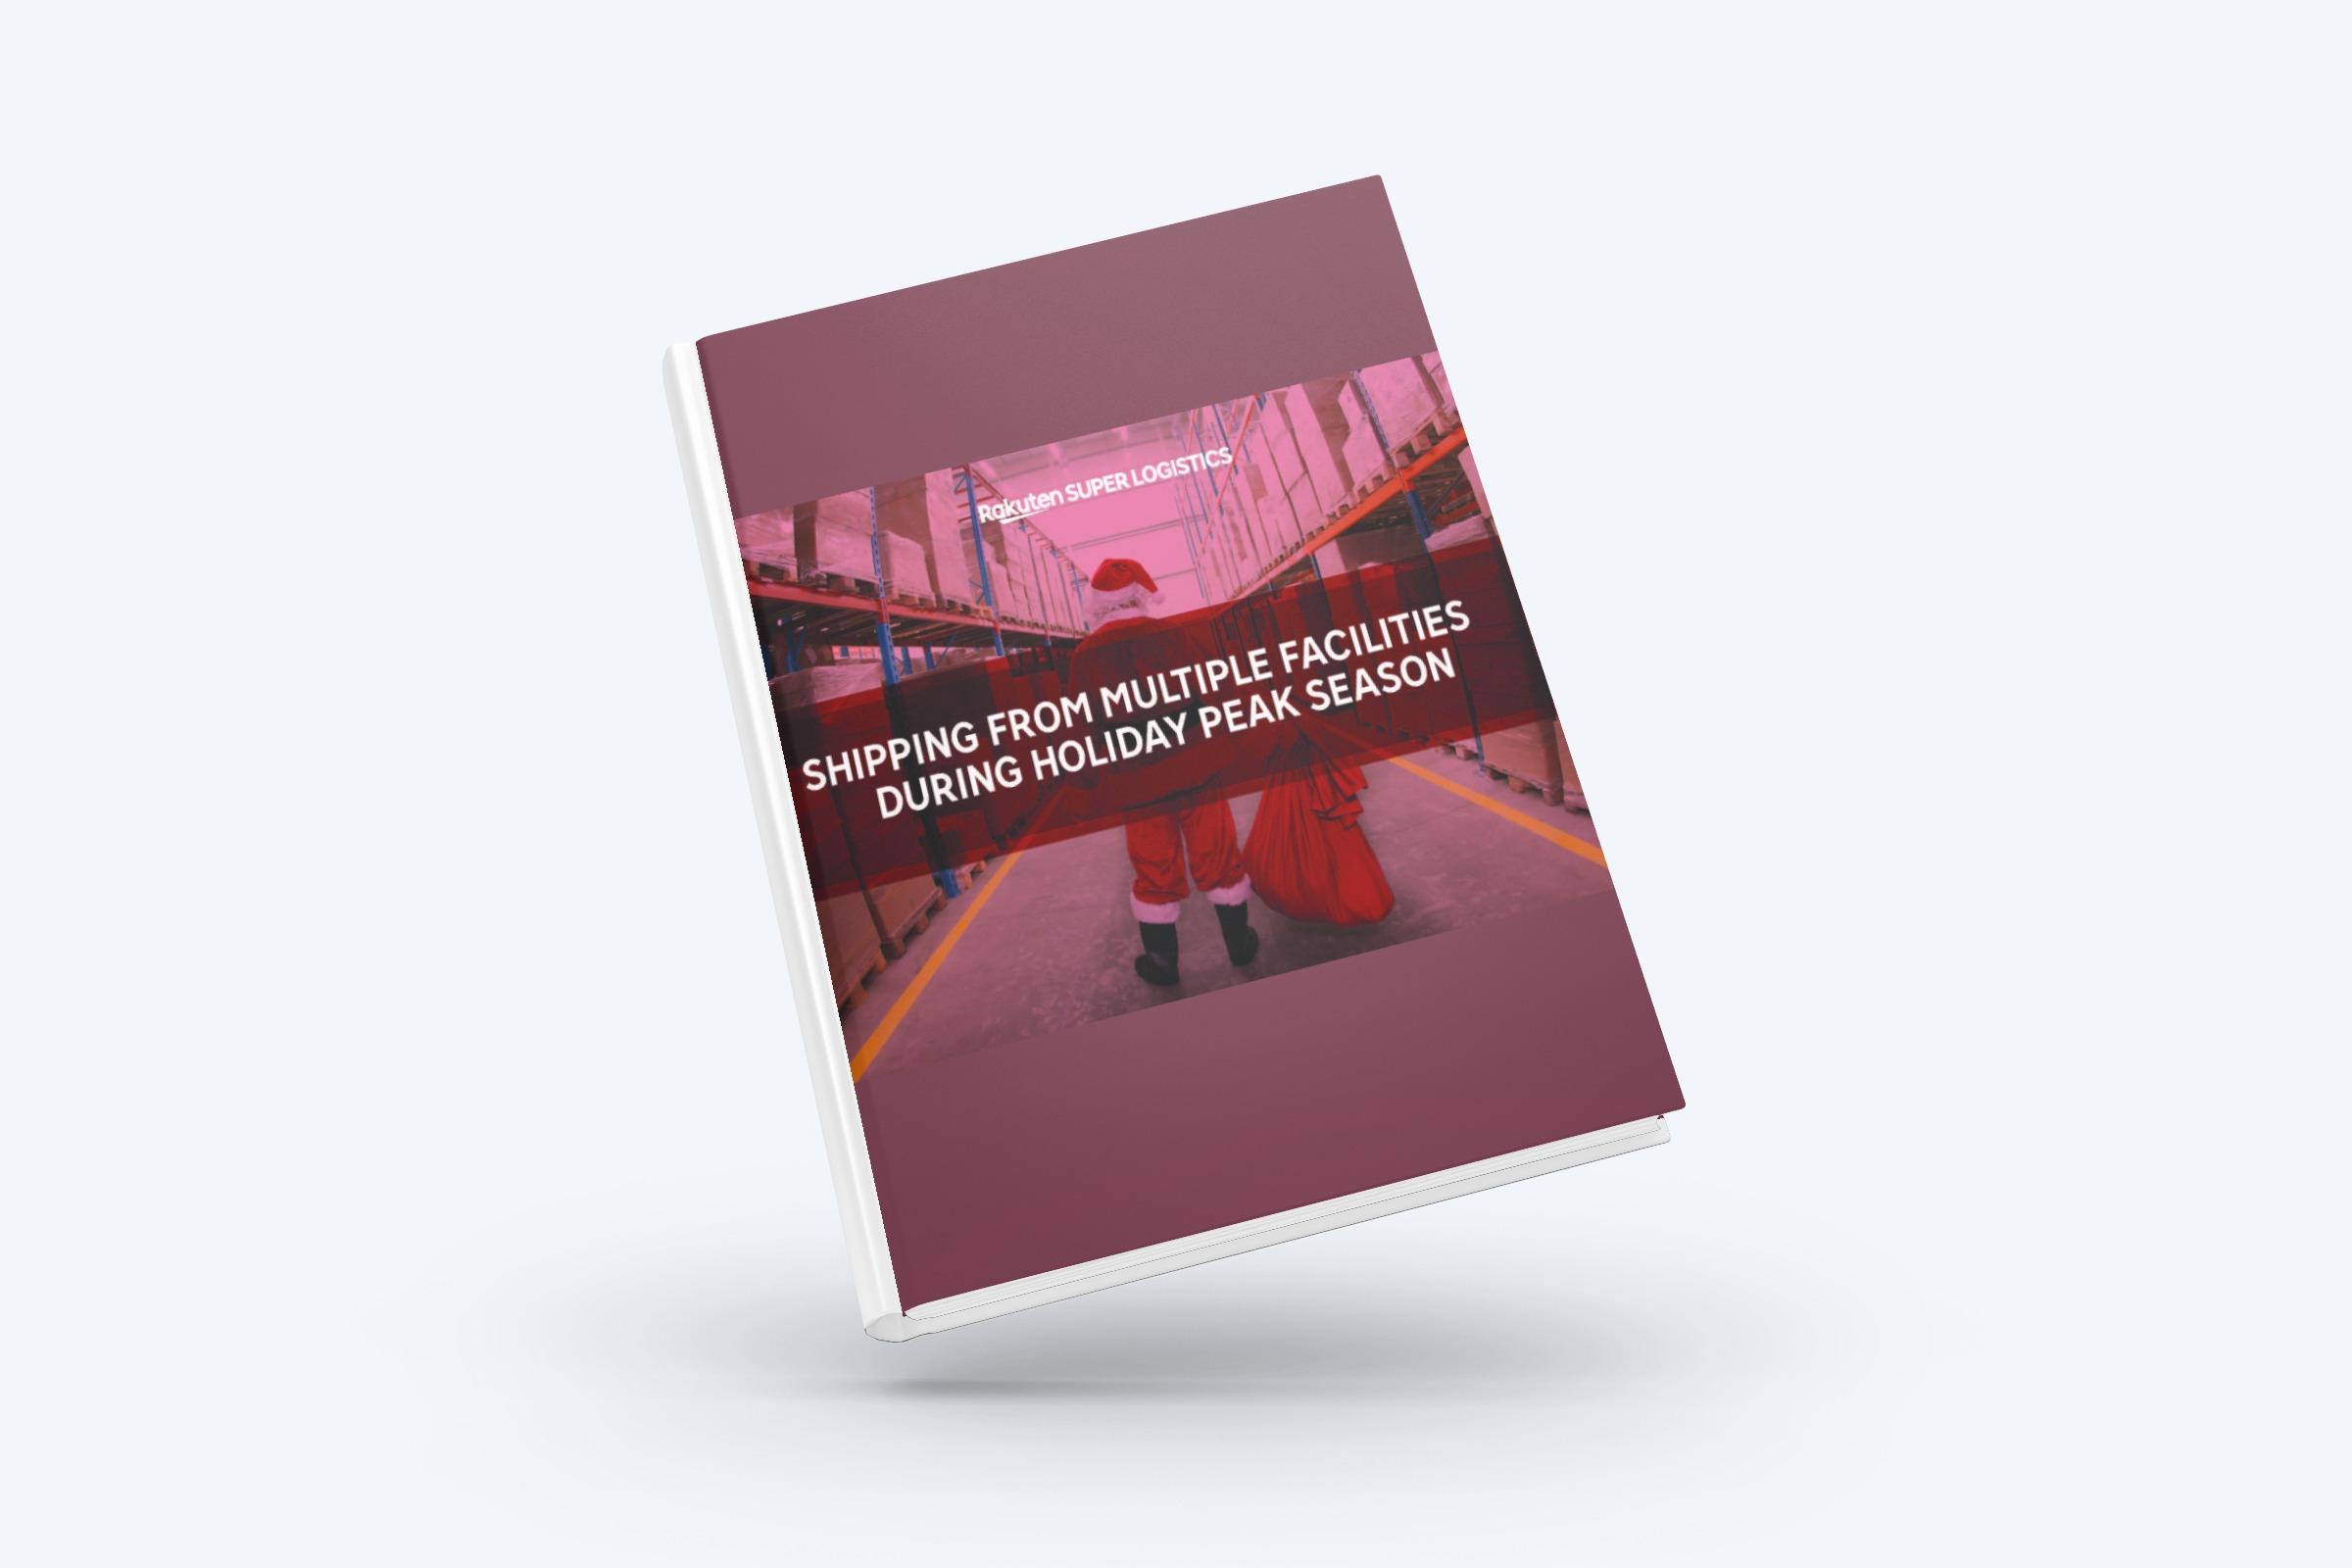 shippingFromMultipleFacilitiesEbook